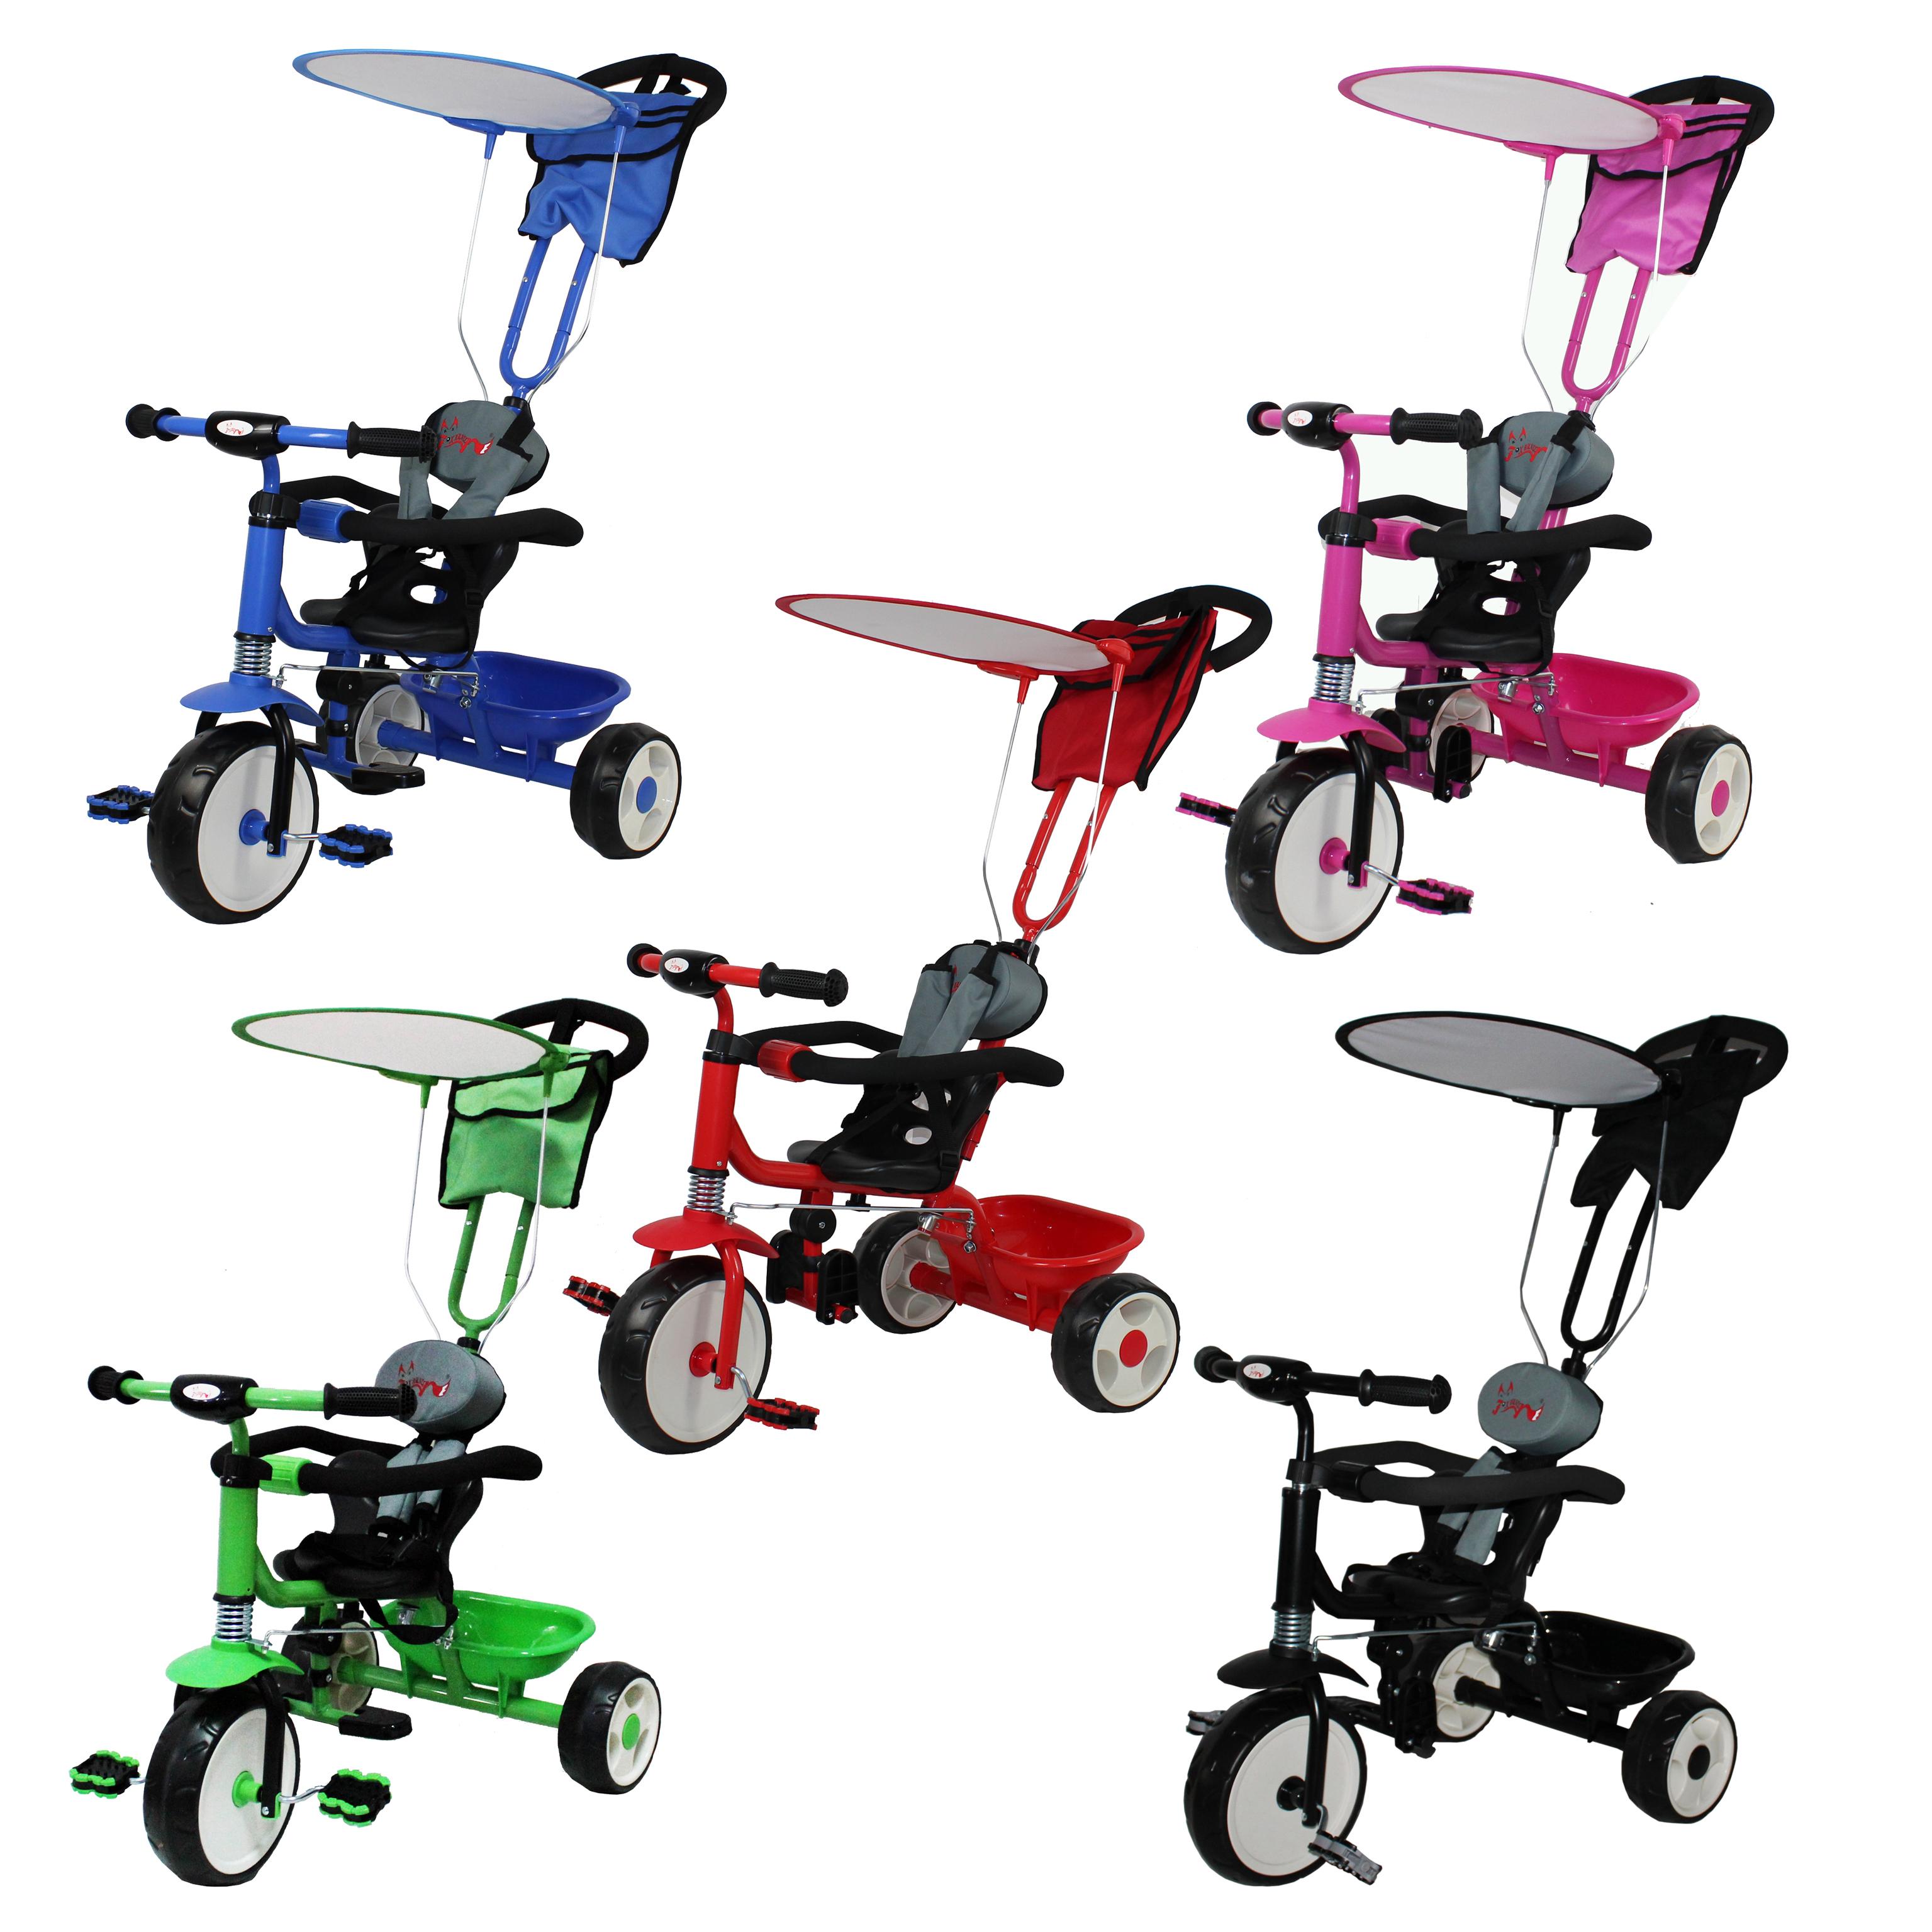 FoxHunter Kids Child Trike Tricycle 3 Wheel 4 In 1 Ride On Bike ...